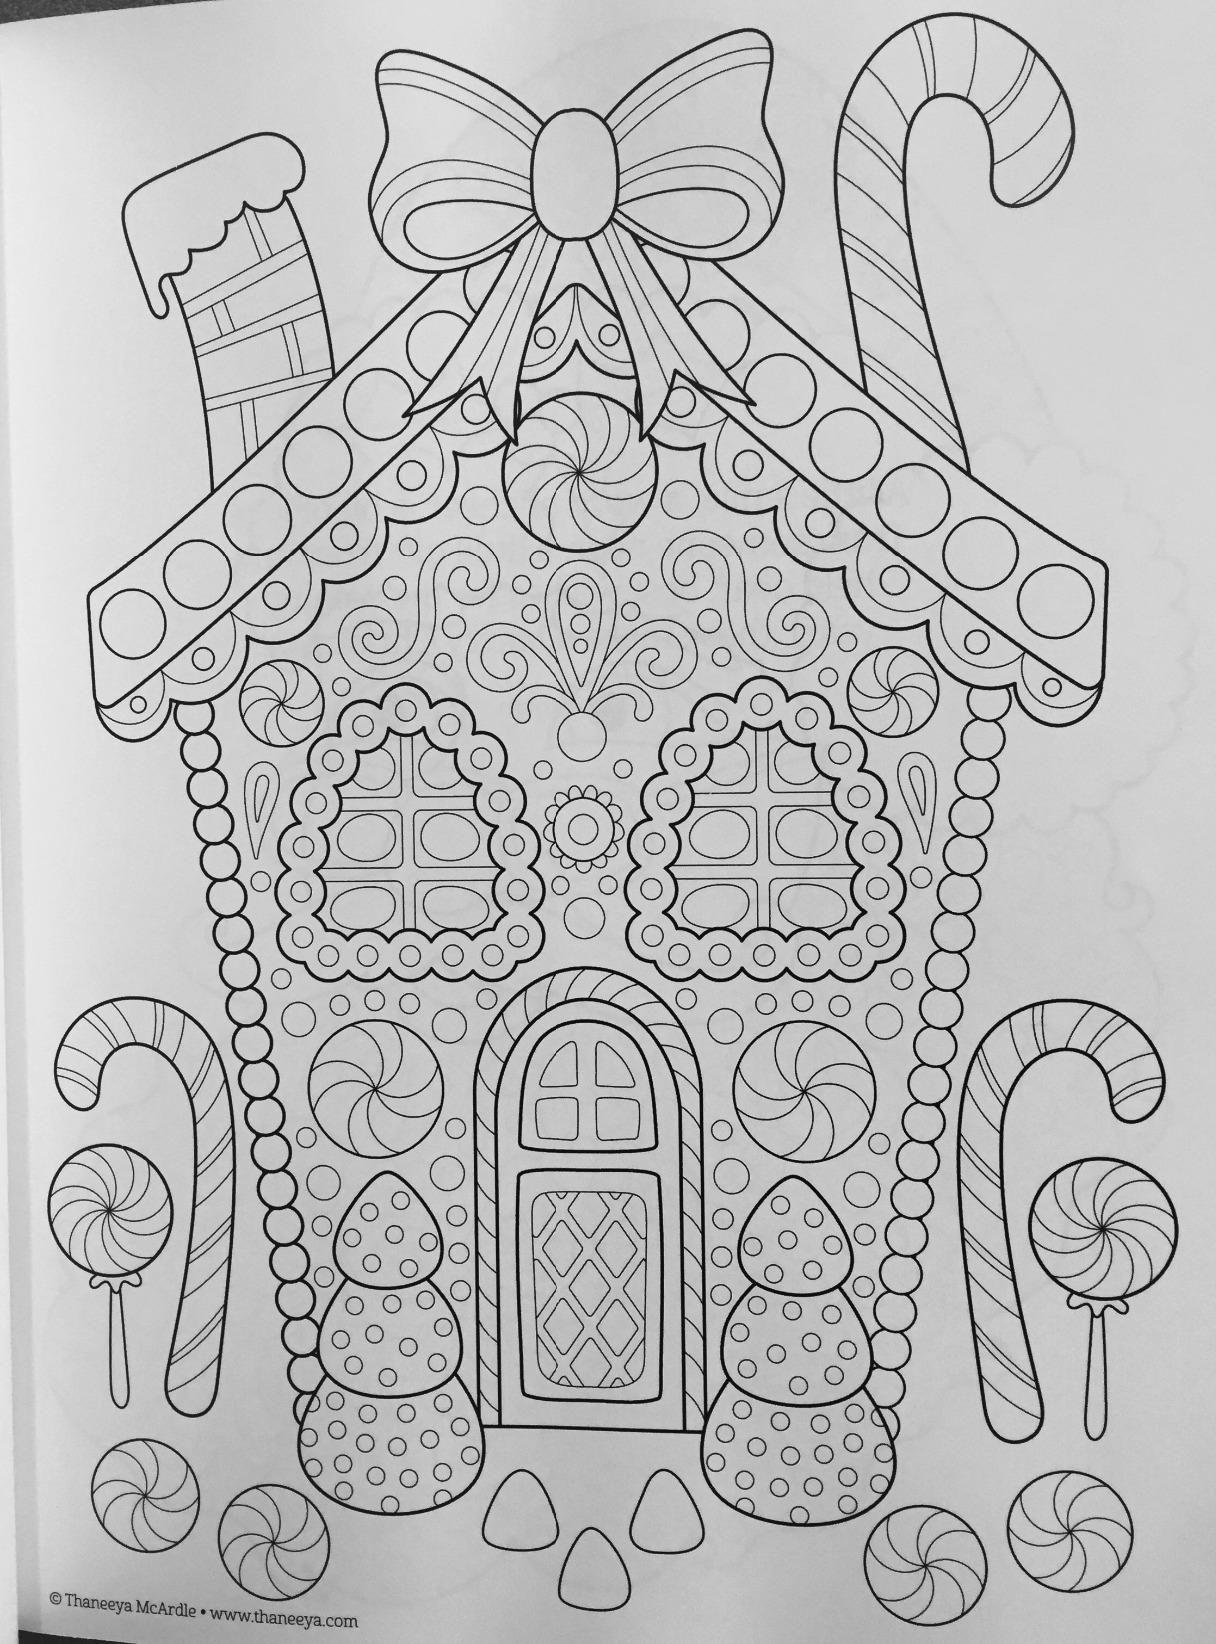 Christmas Coloring Book (coloring Is Fun): Thaneeya Mcardle